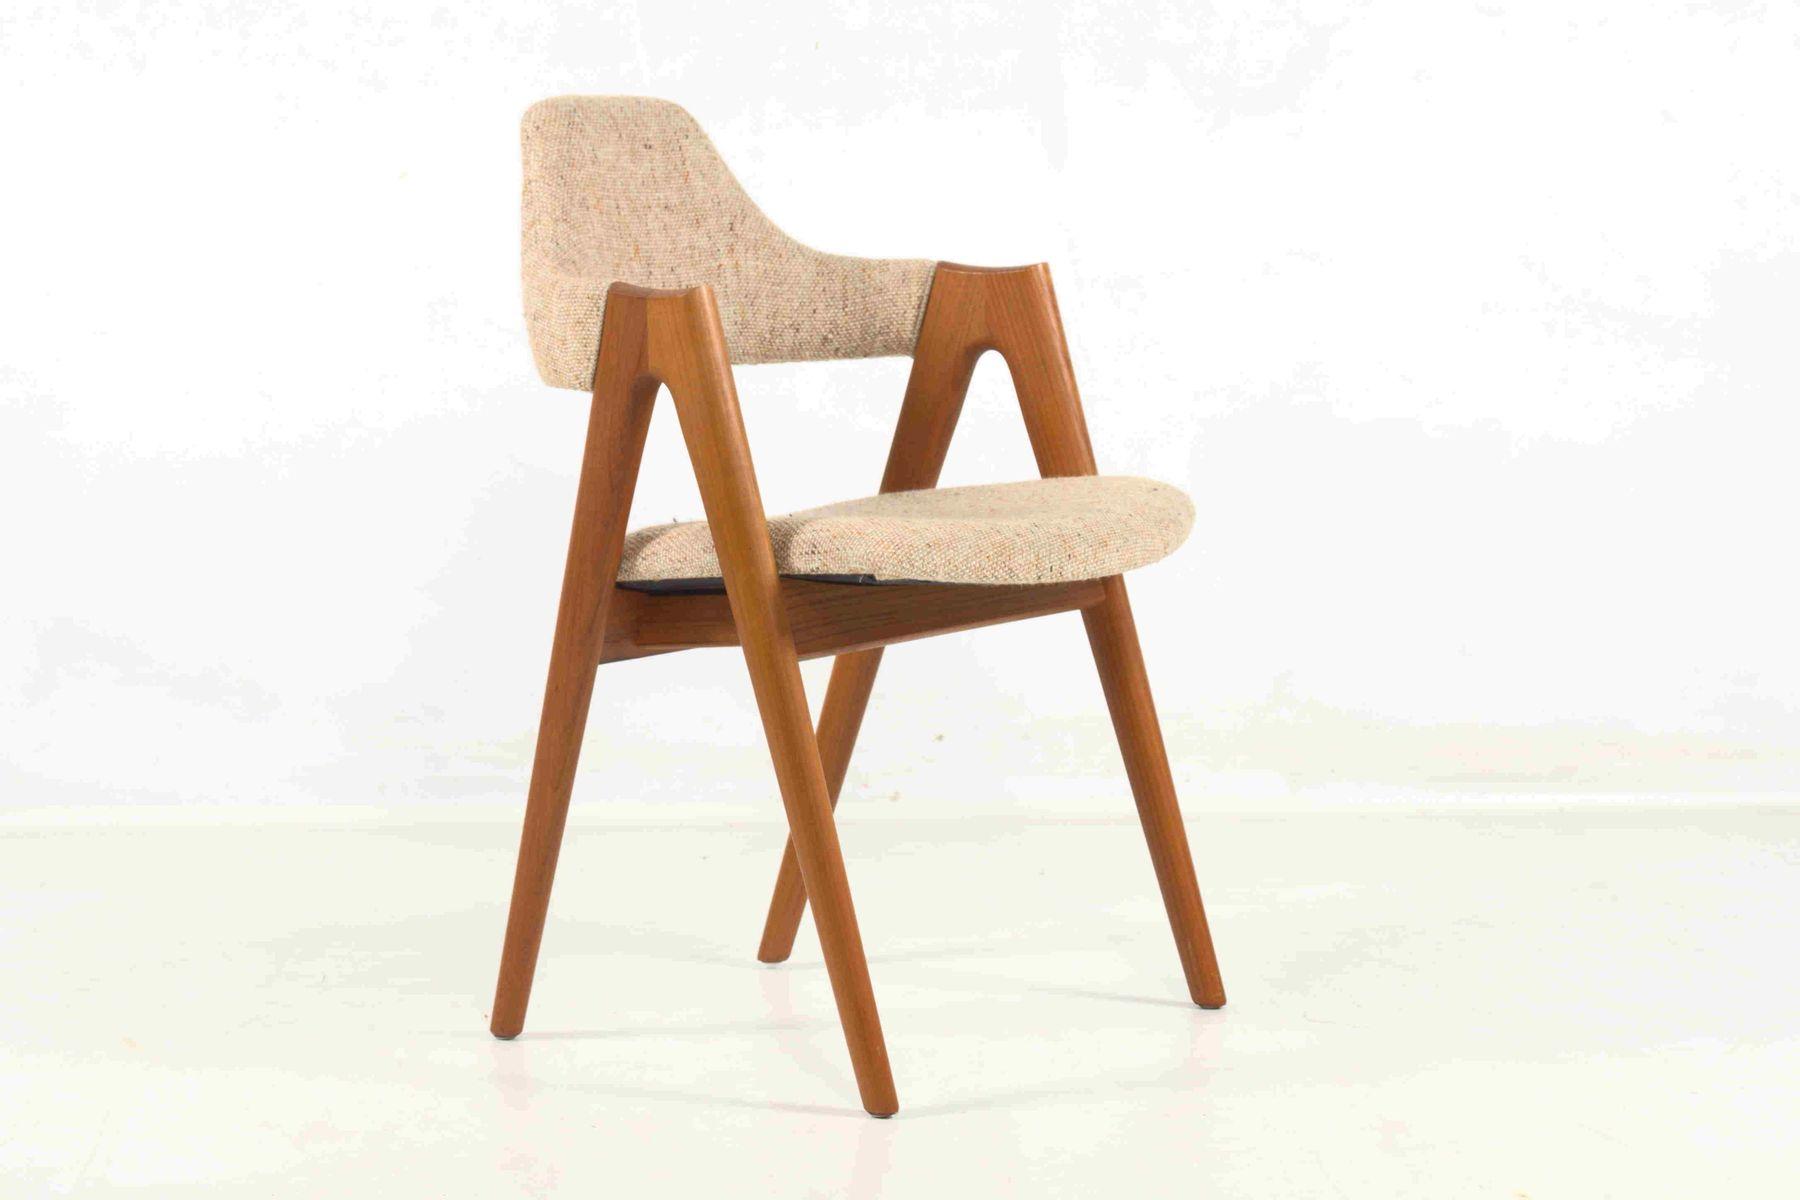 Danish Vintage Chair in White Wool by Kai Kristiansen for SVA